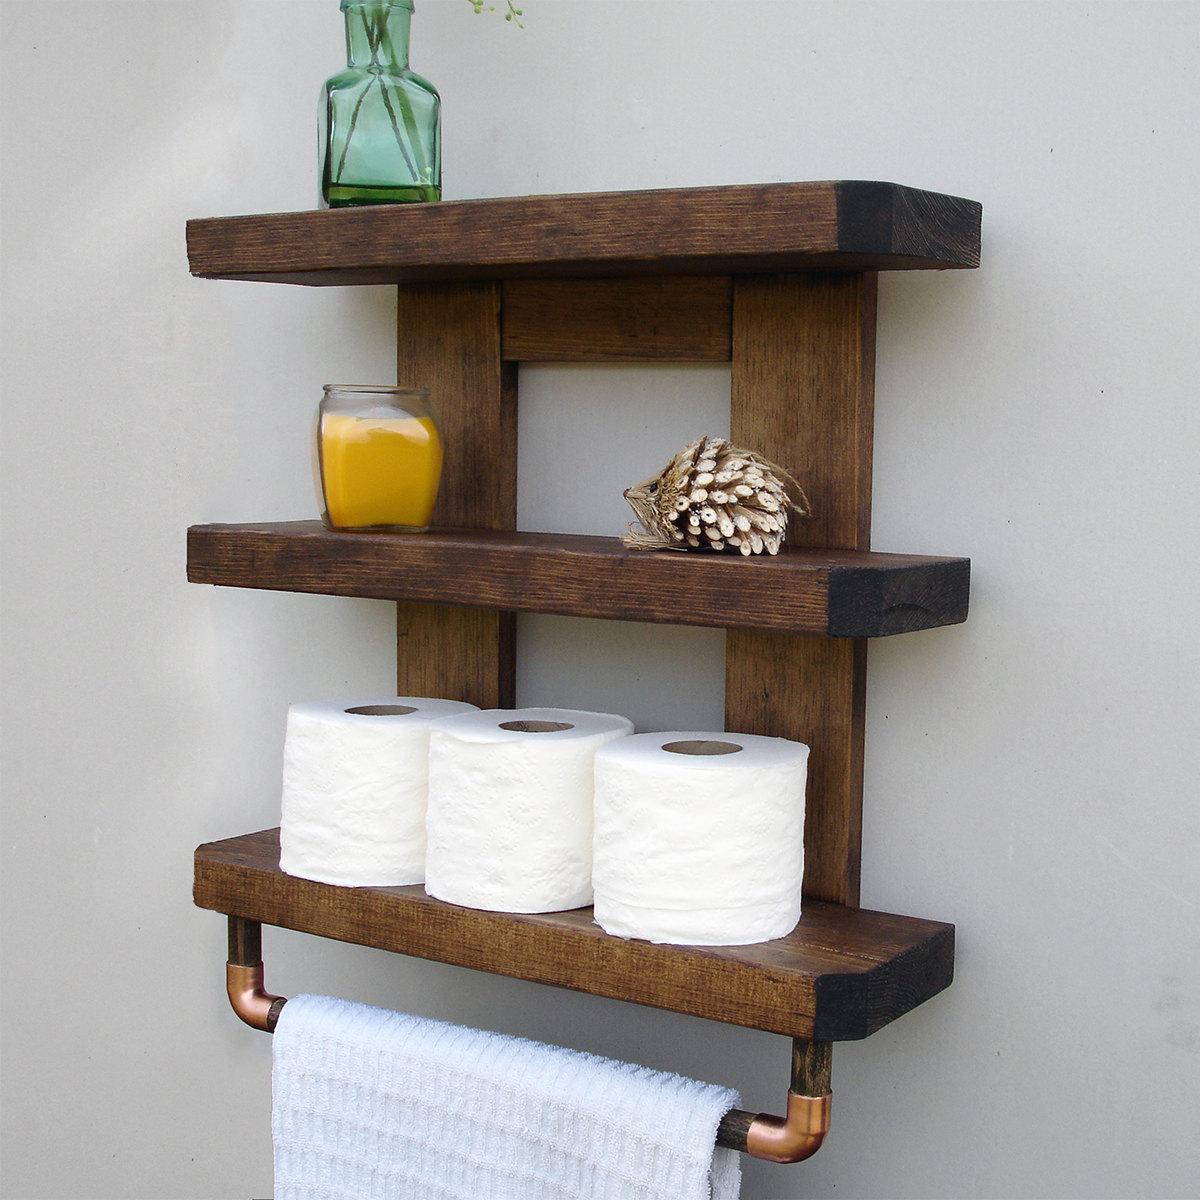 Declutter with Bathroom Shelves - goodworksfurniture